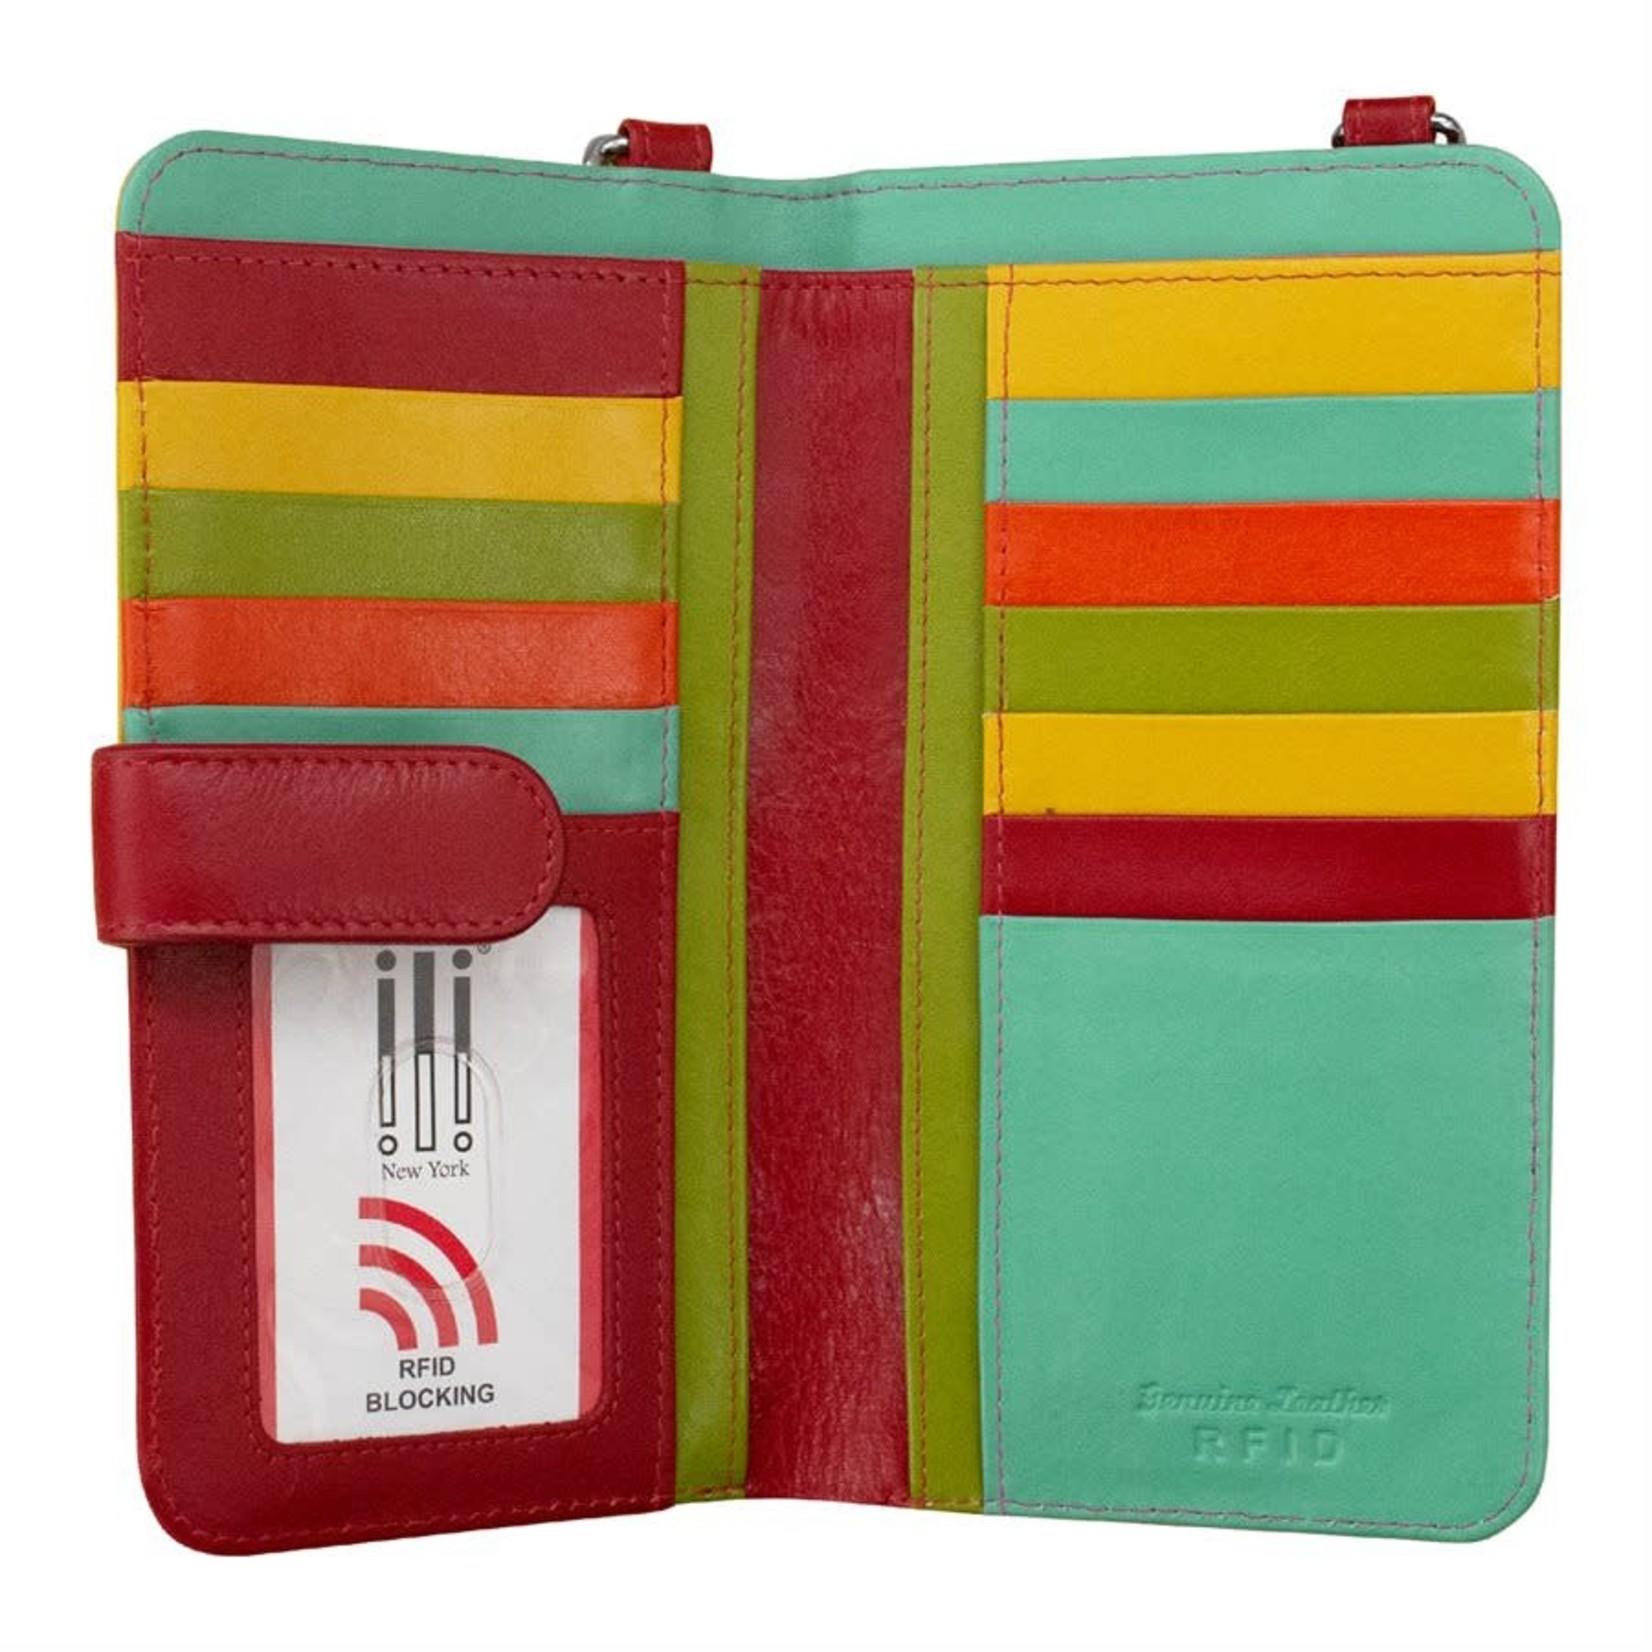 Leather Handbags and Accessories 6363 Citrus - RFID Organizer Crossbody